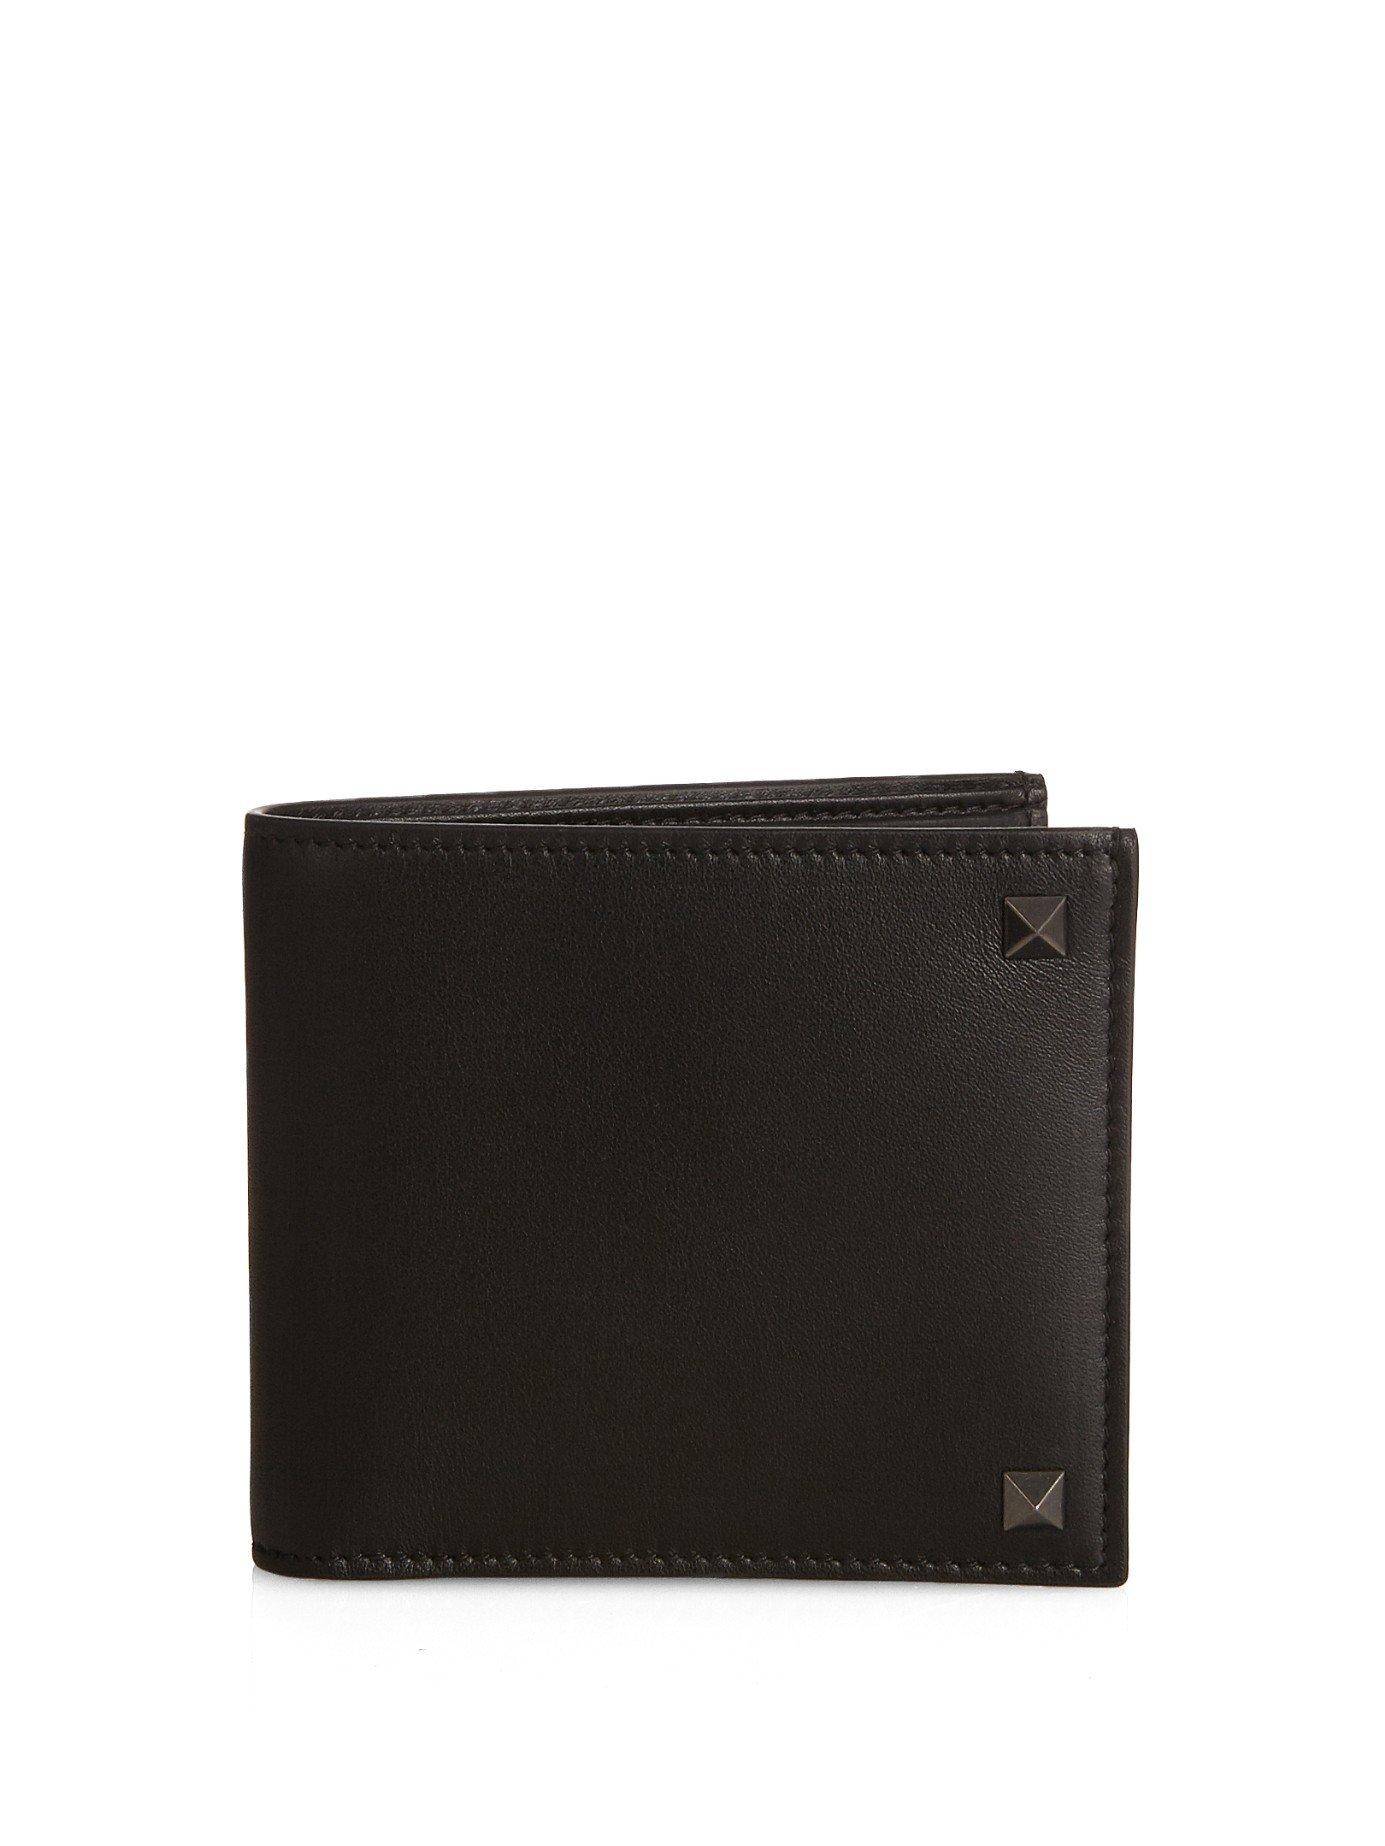 Valentino Rockstud Bi-fold Leather Wallet in Black for Men | Lyst